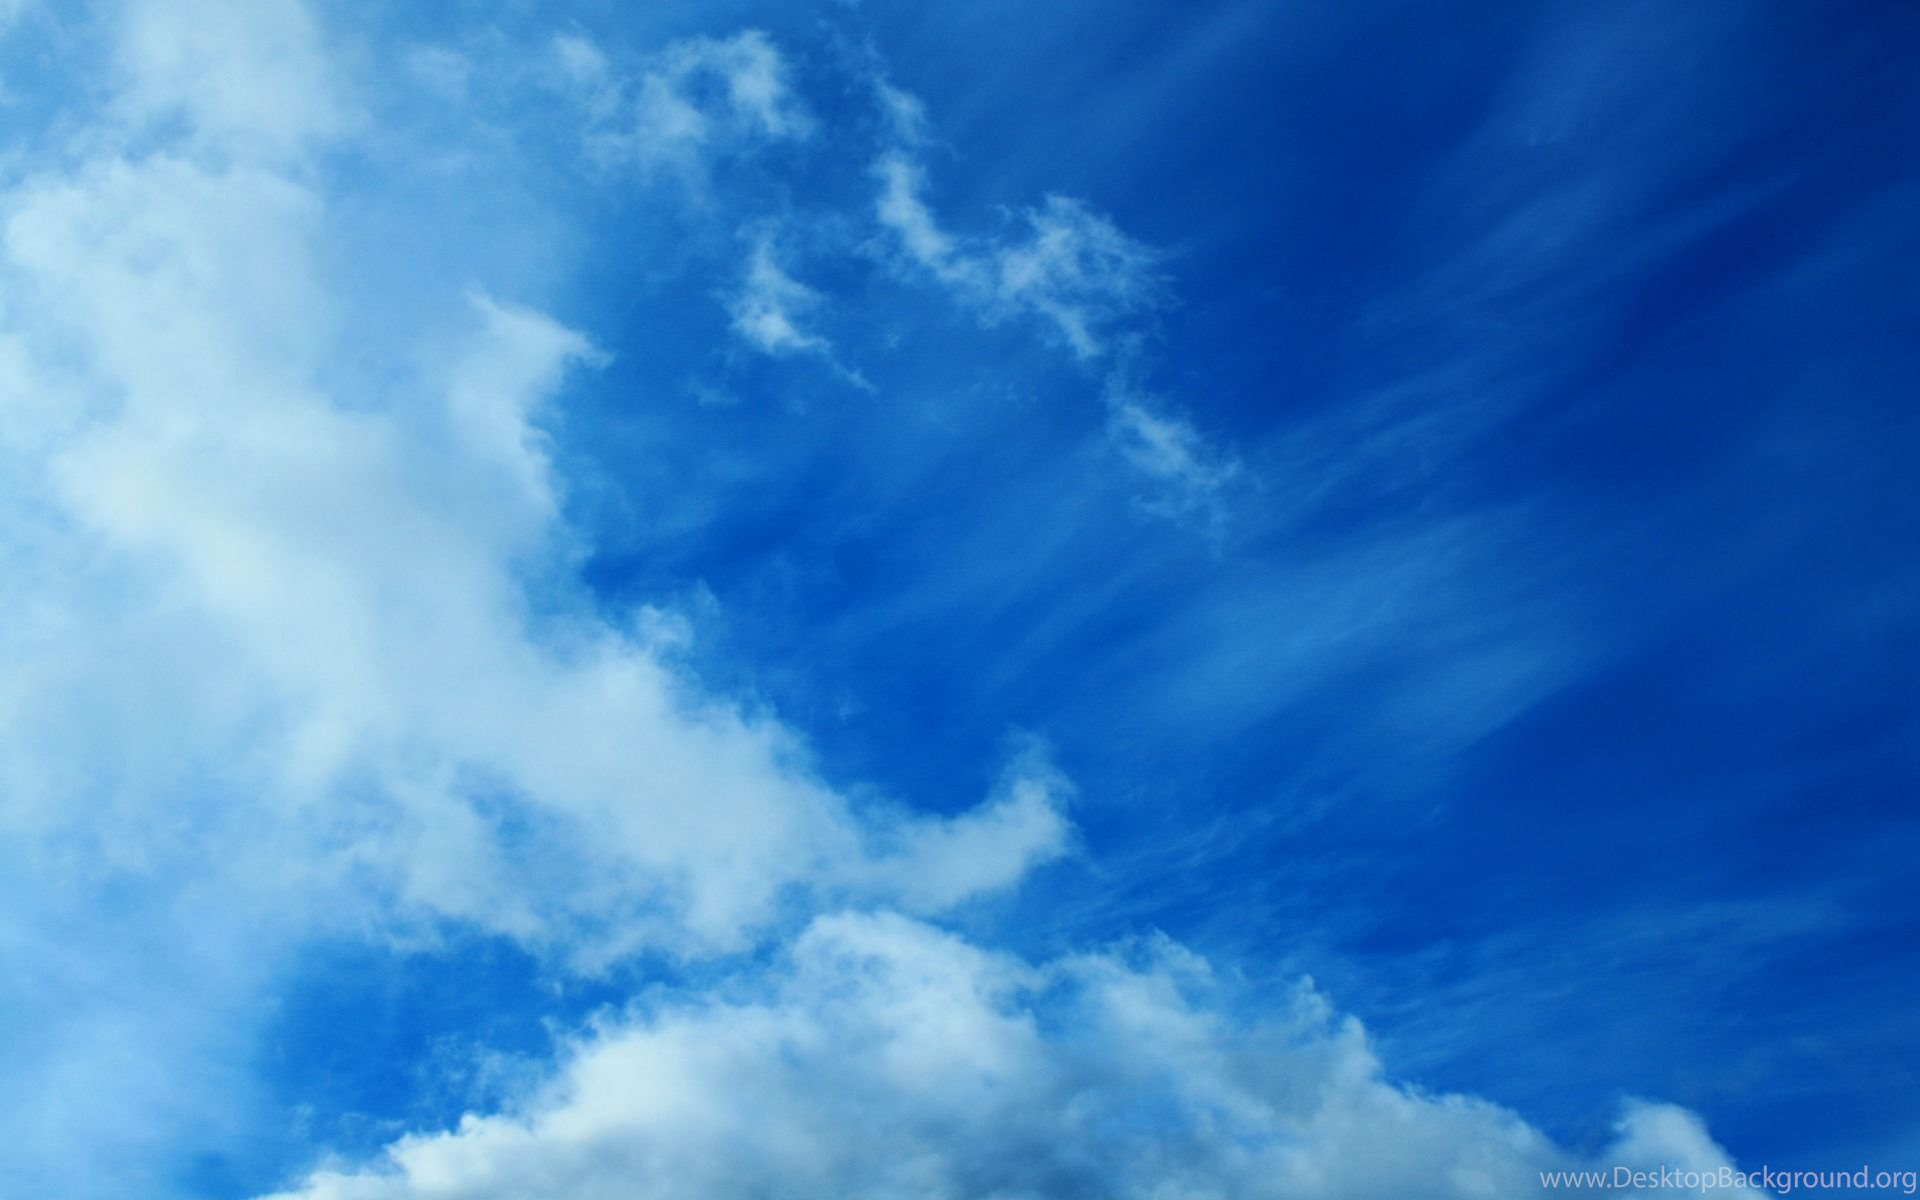 Full HD Wallpapers + Nature, Sky, Clouds, Blue Desktop